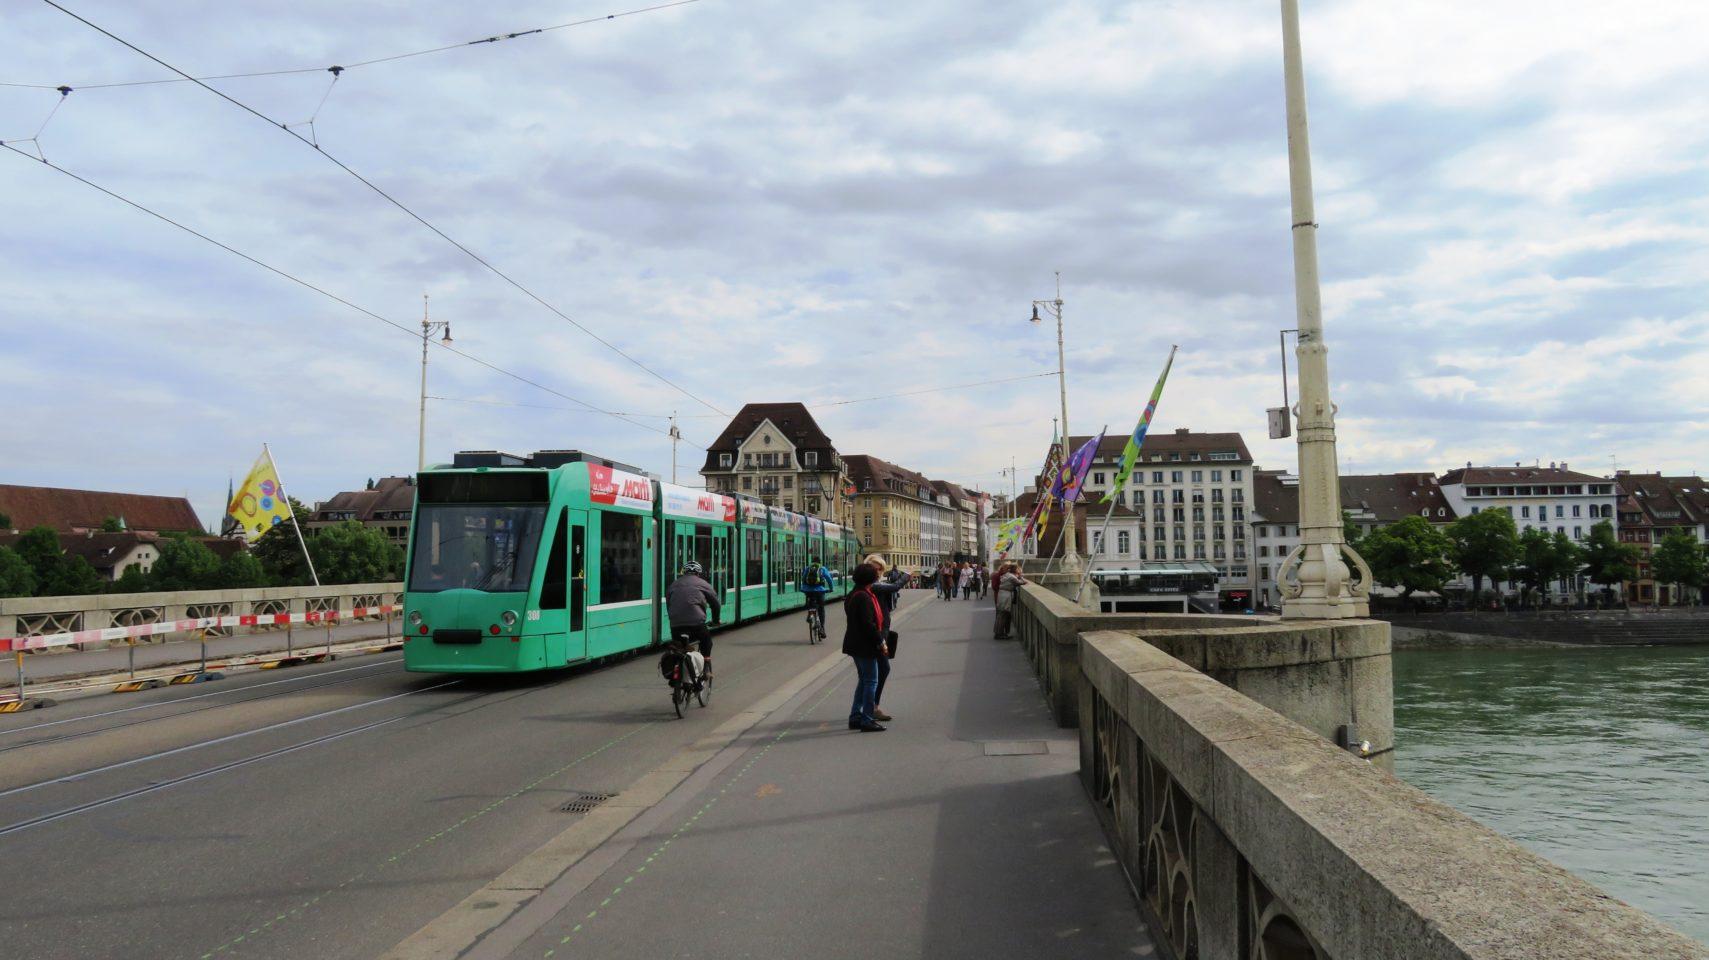 Tram on the Mittlere Brucke in Basel, Switzerland